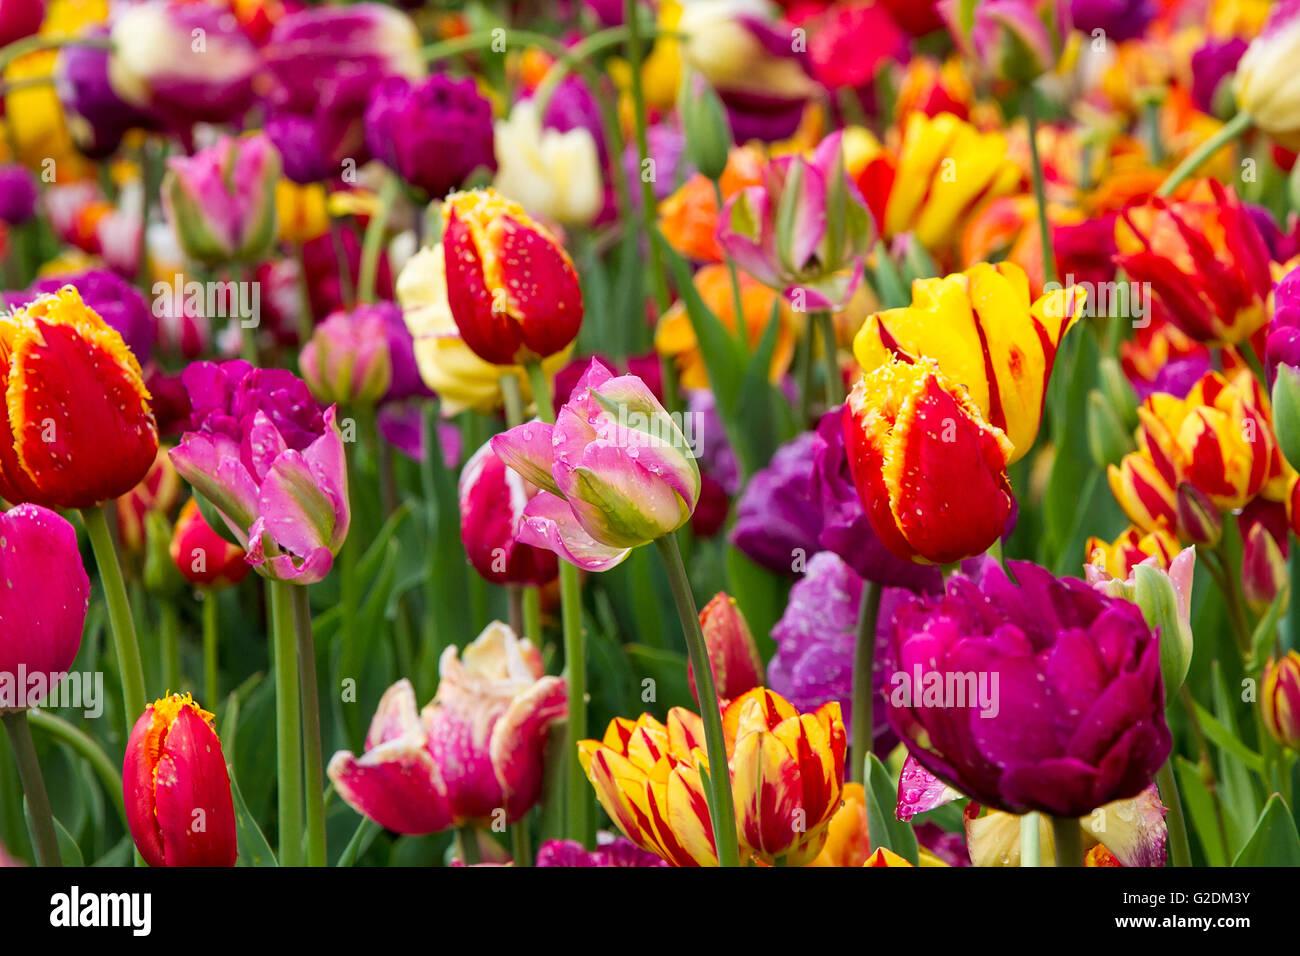 tulips tulip spring flower garden background nature red green